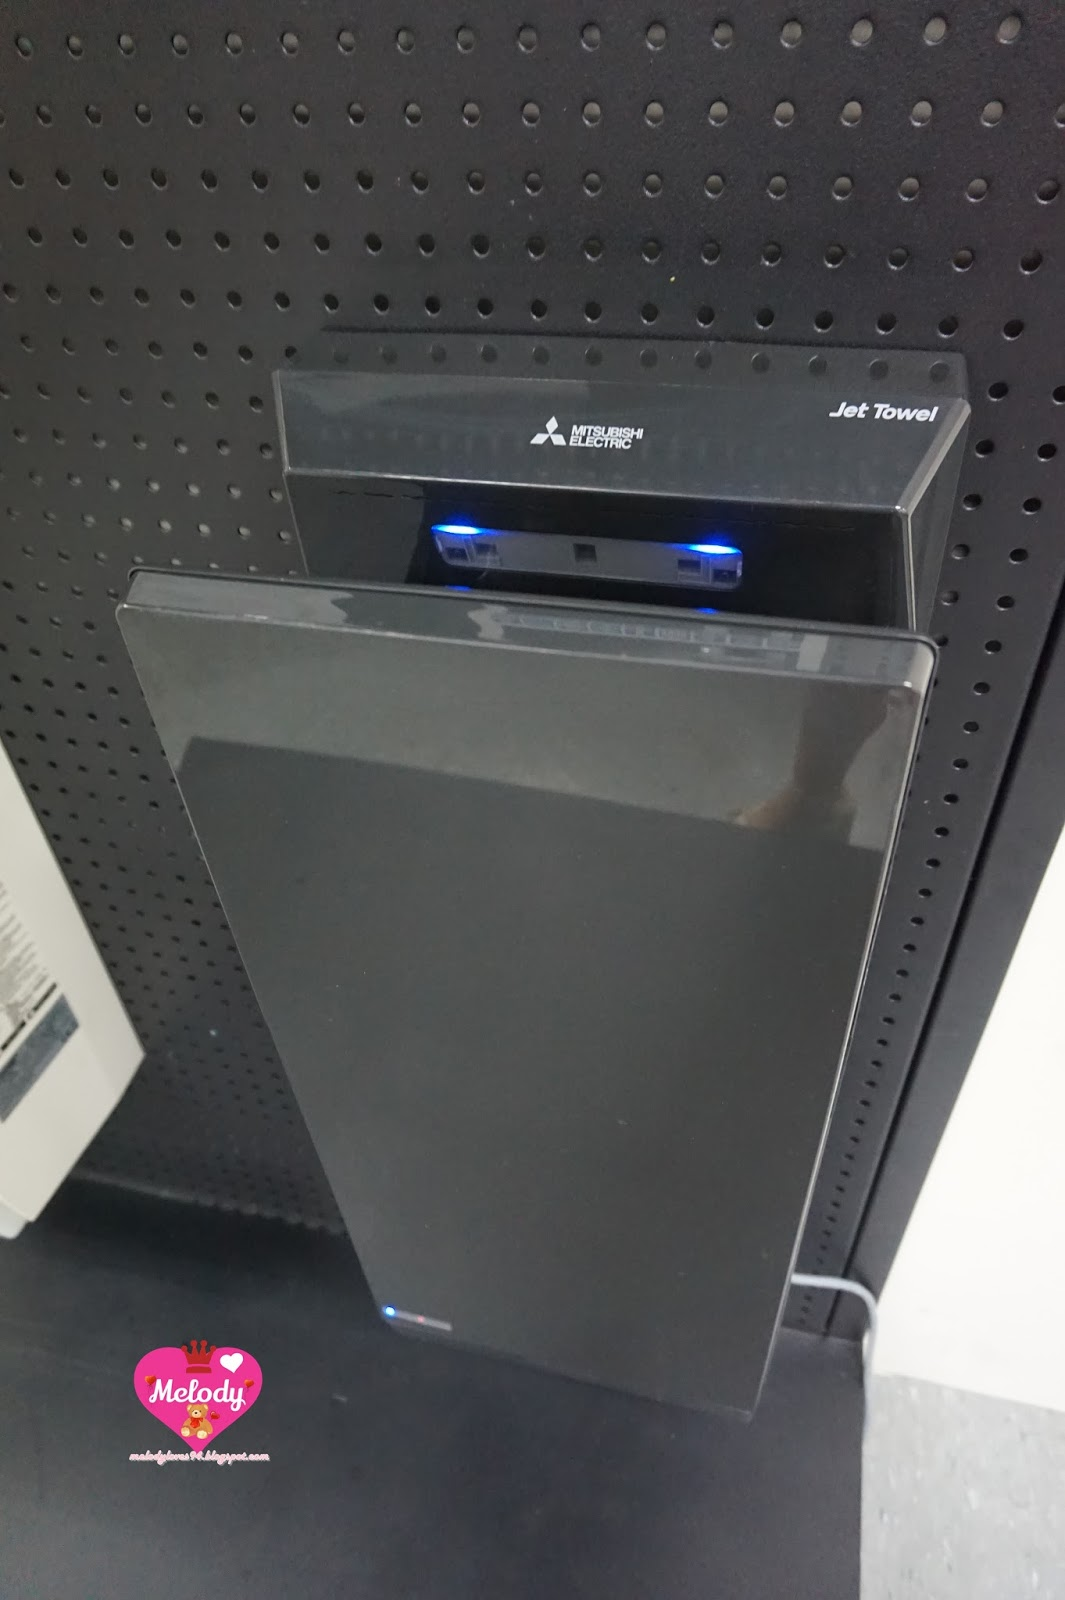 towel colour electric dryer jet custom mitsubishi australia smart jt hand